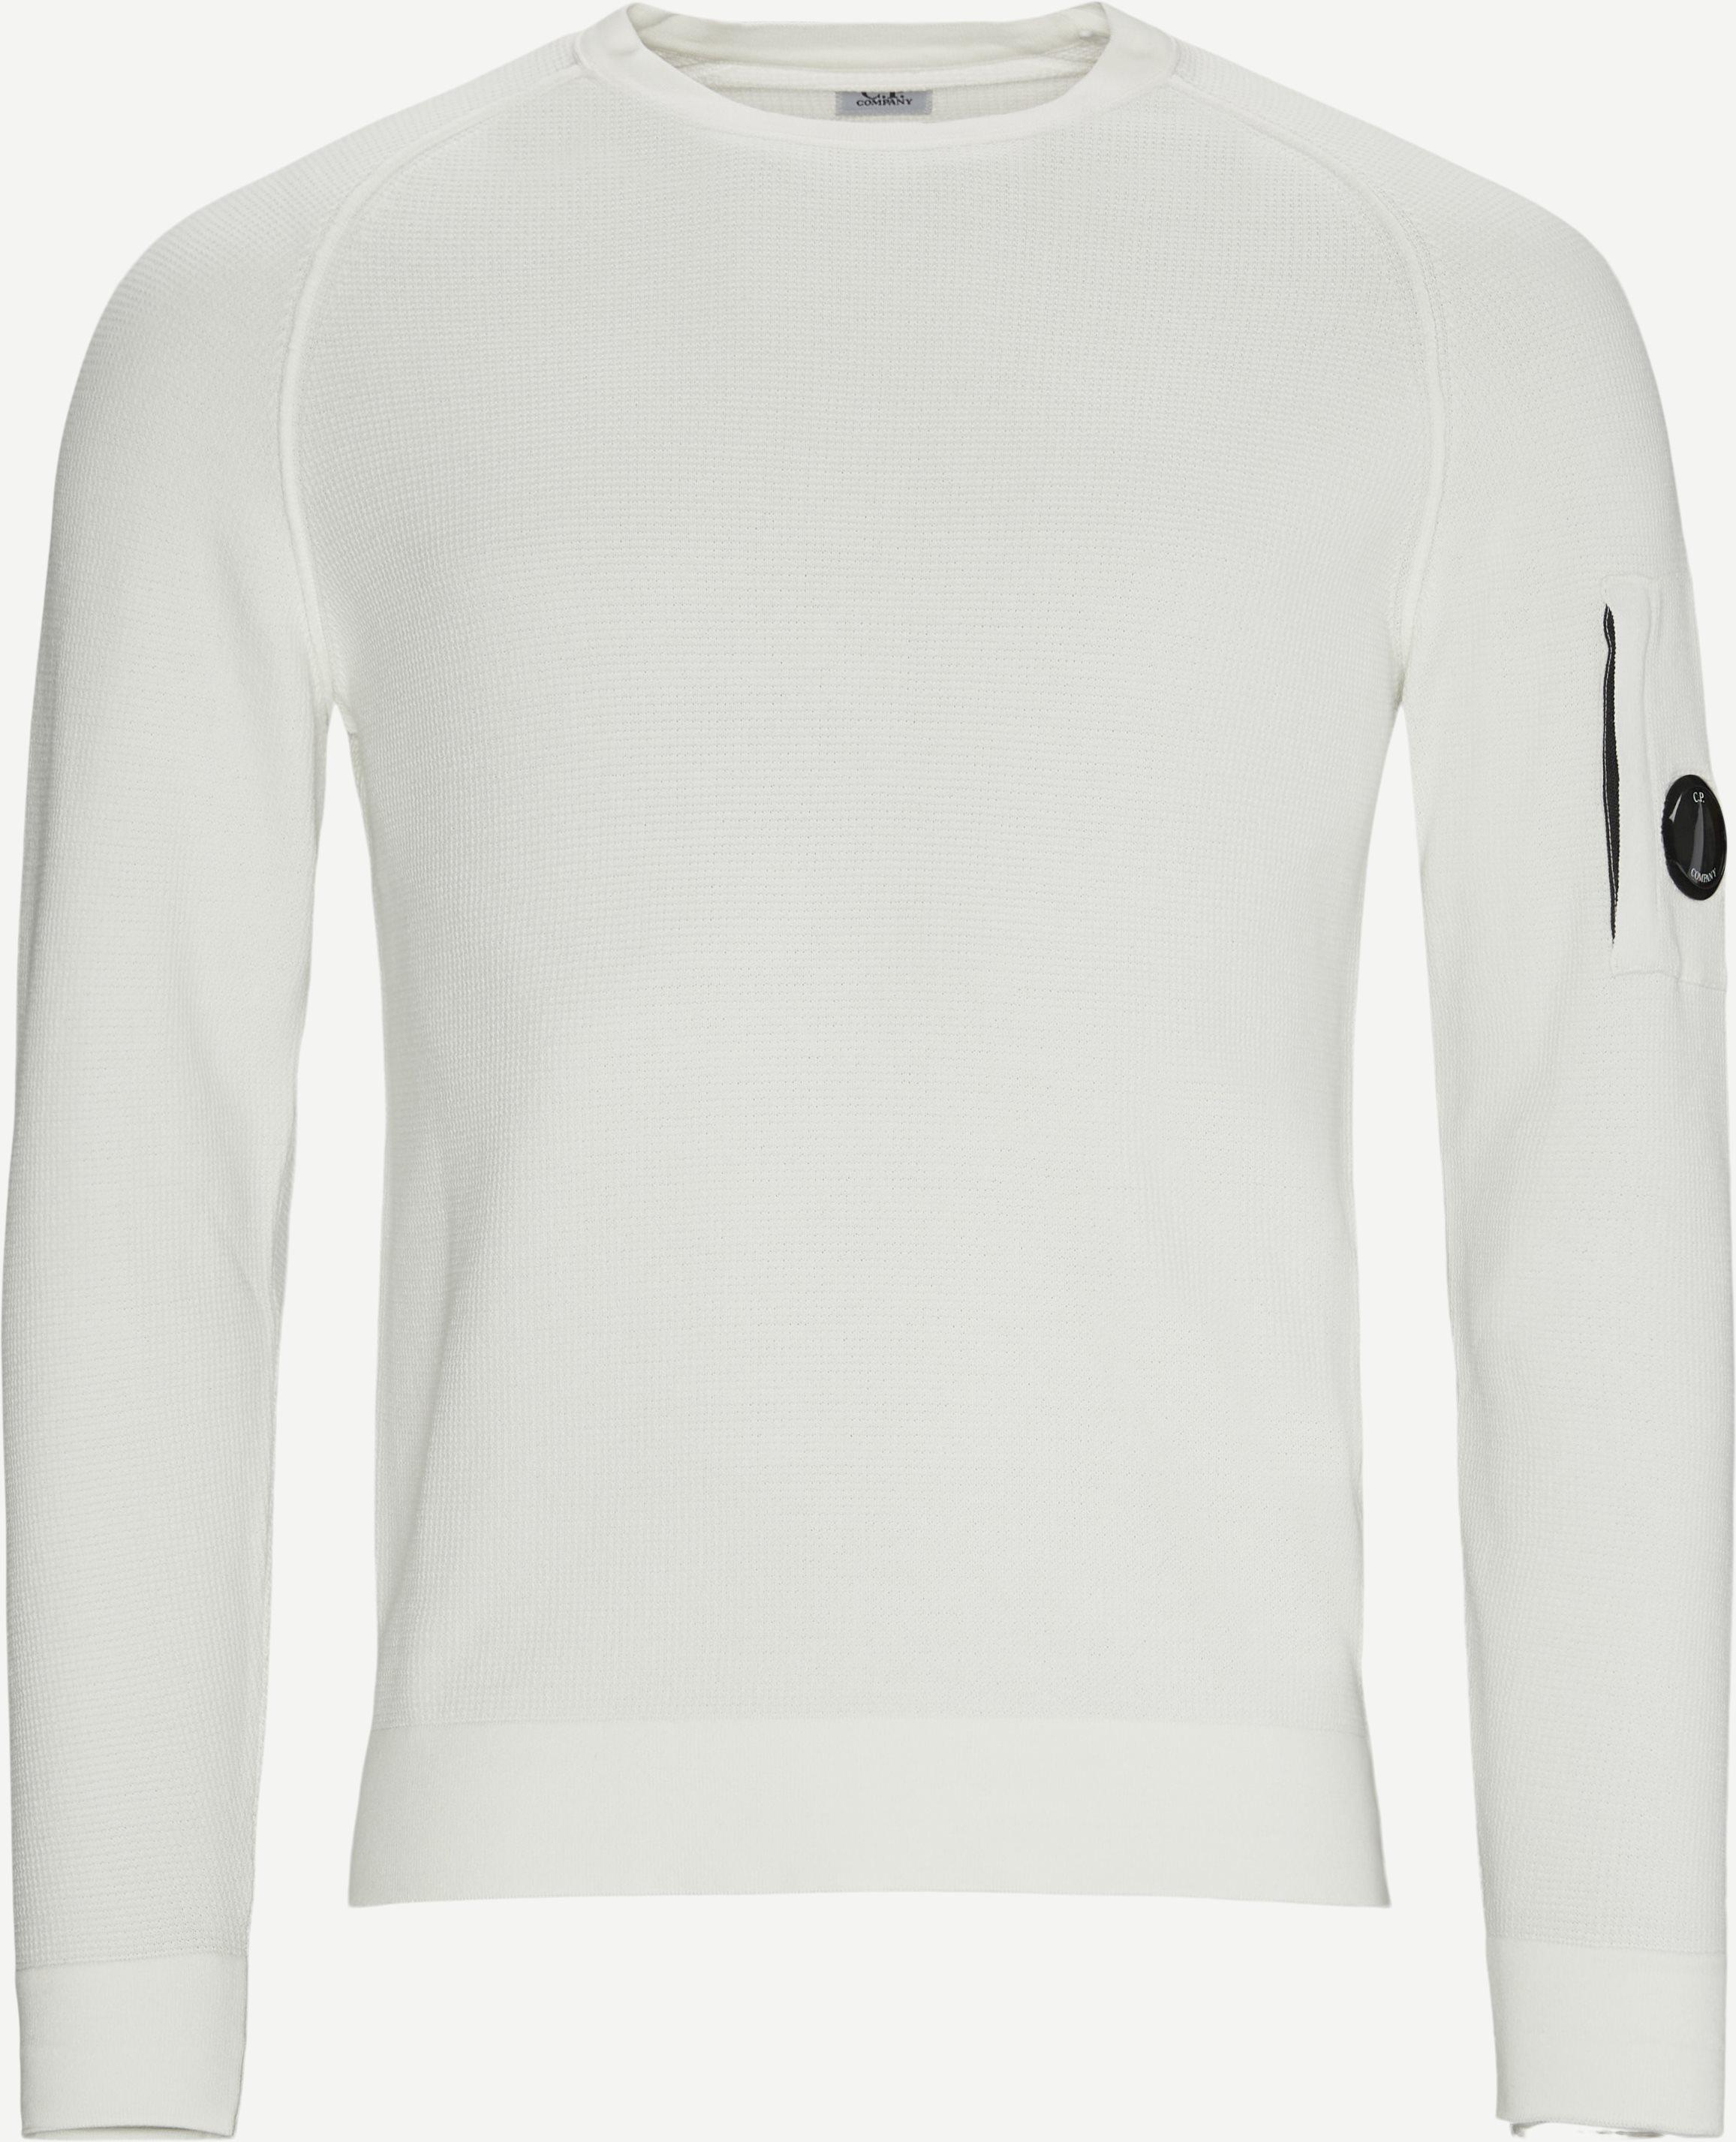 Waffle Knitted Lens Logo Crewneck - Knitwear - Regular - White